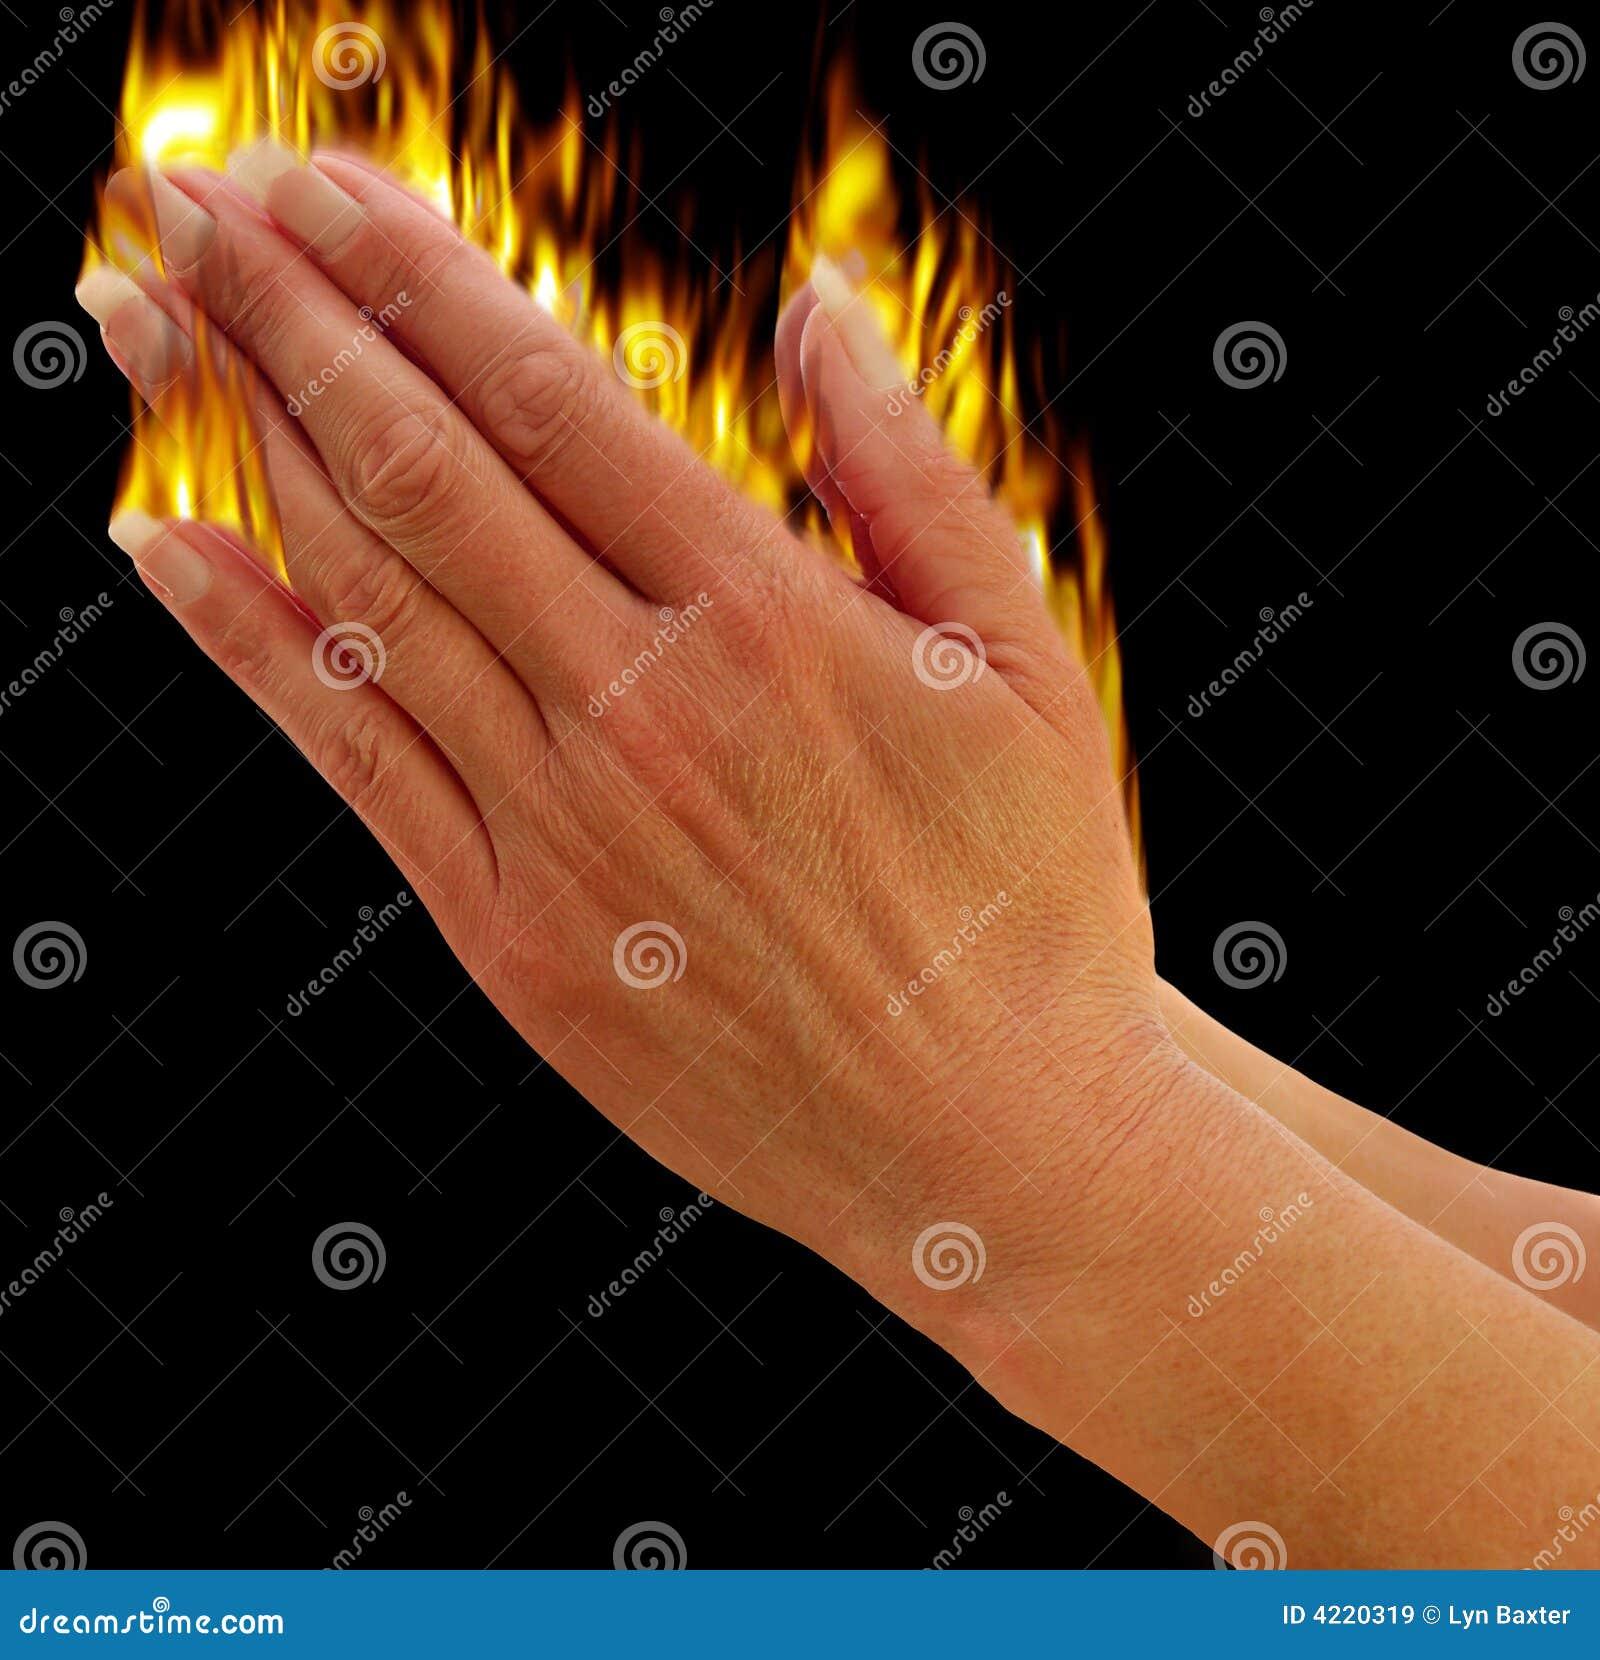 Hands Praying Royalty Free Stock Images Image 4220319